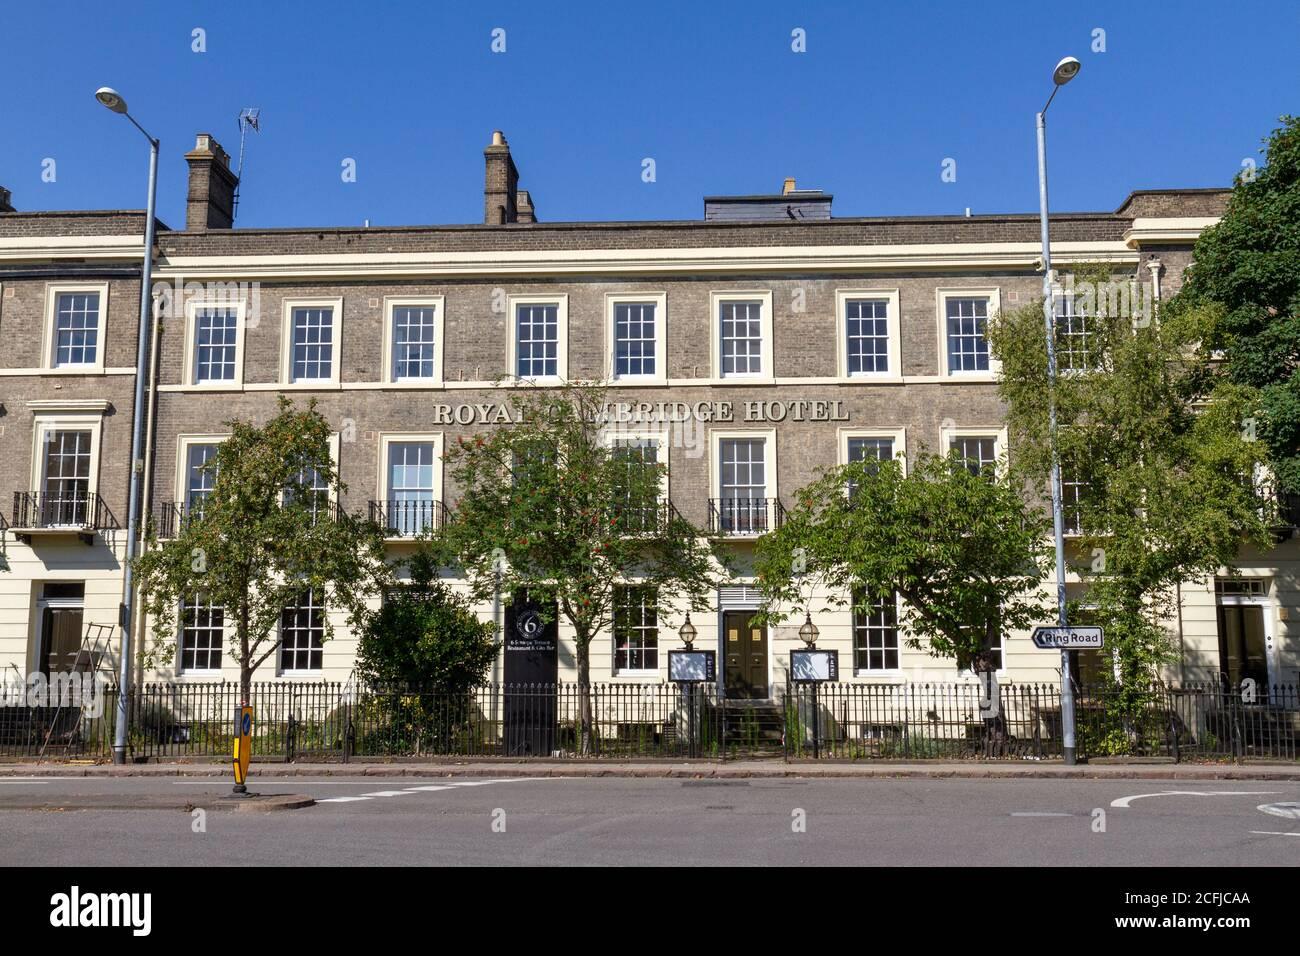 The Royal Cambridge Hotel on Trumpington Street, Cambridge, Cambridgeshire, UK. Stock Photo